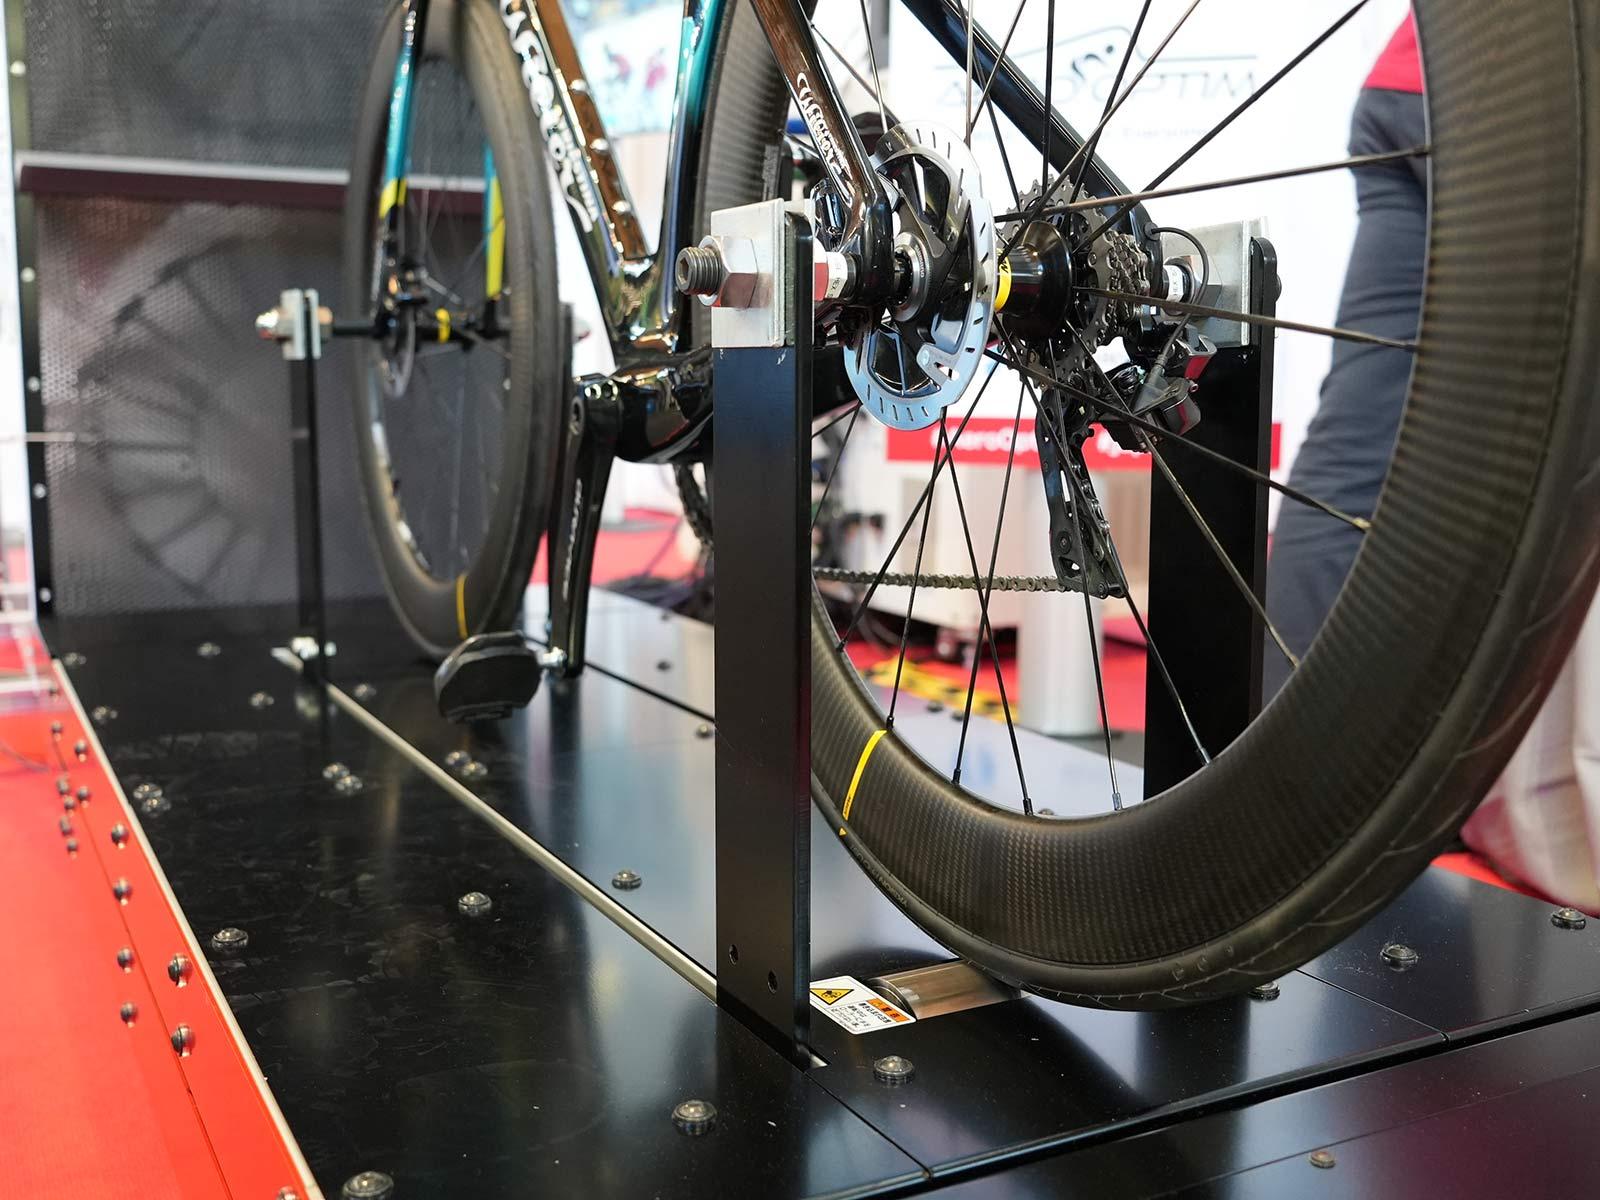 strain gauge platform for measuring aerodynamic drag in the portable aero optim wind tunnel